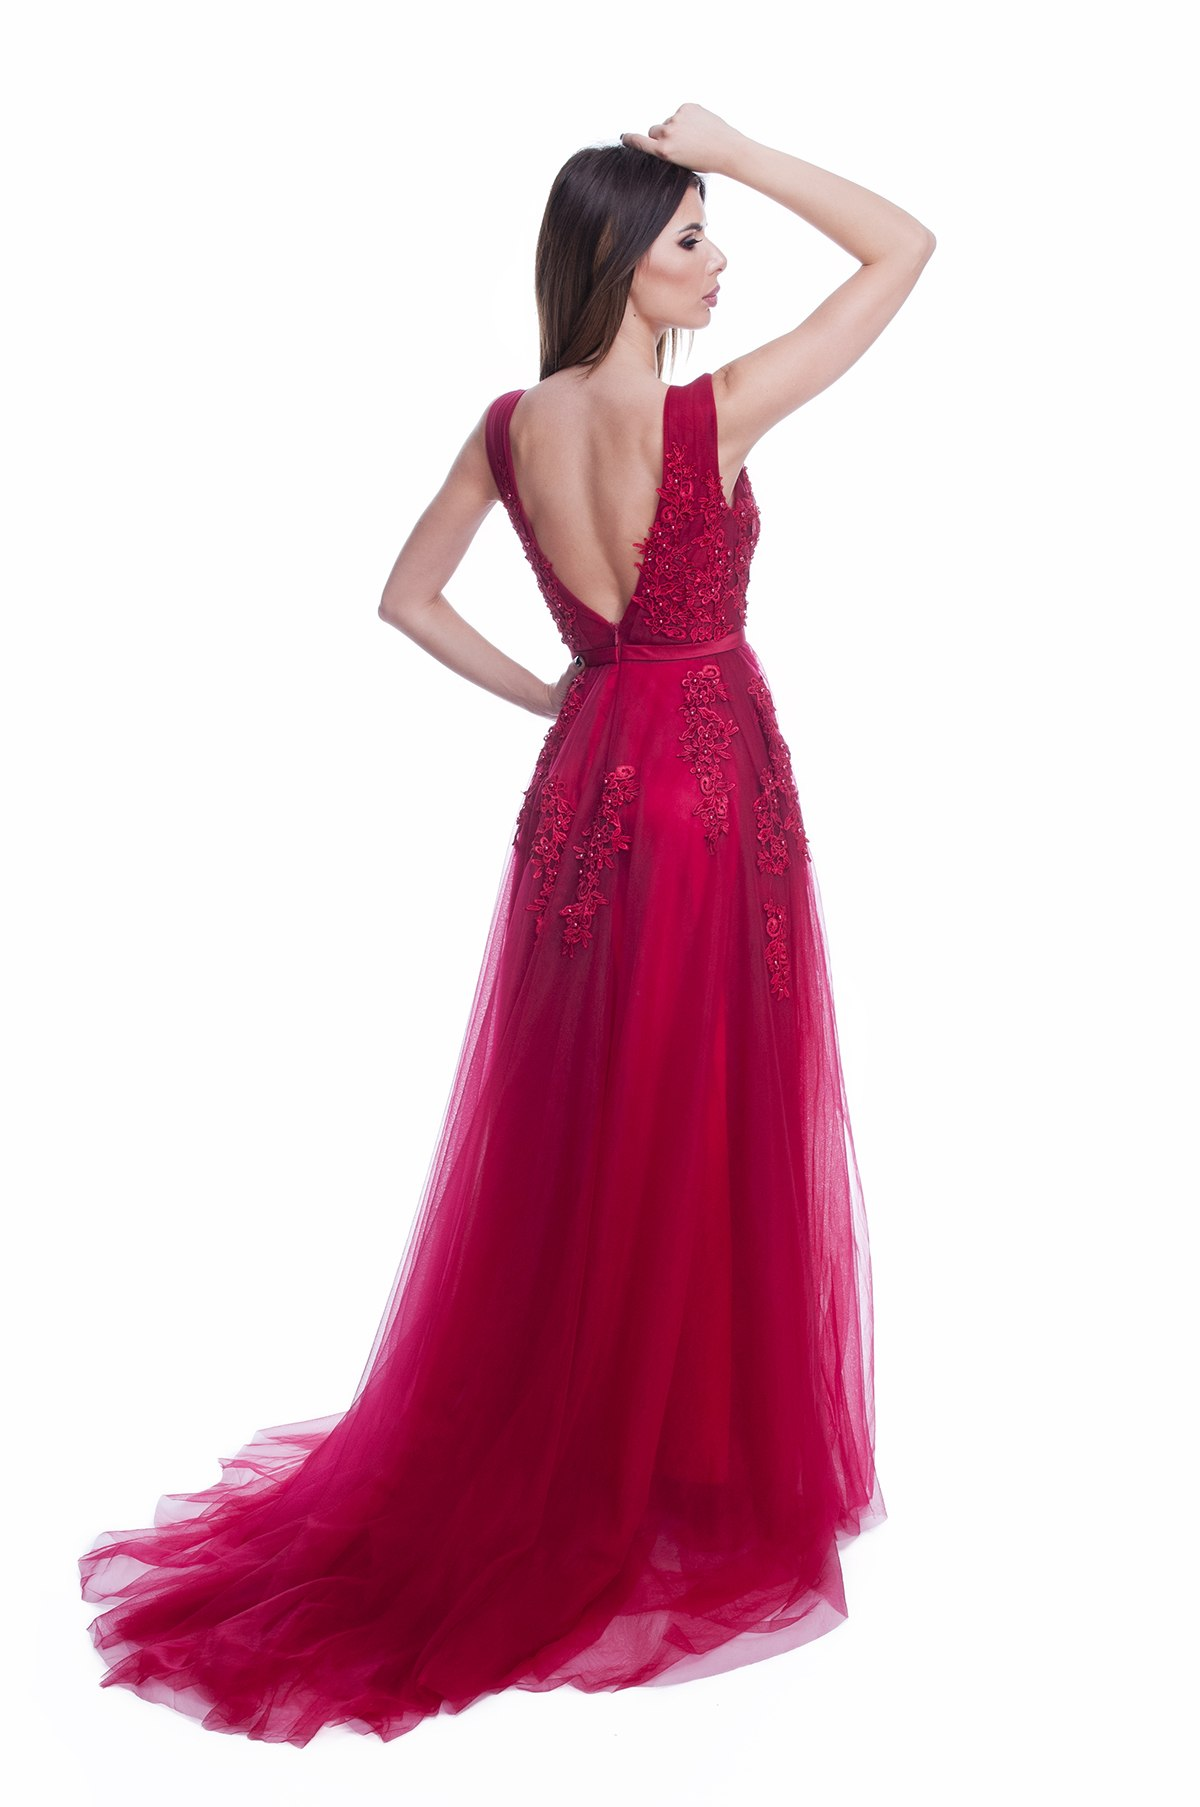 Poze de produs fashion rochii lungi